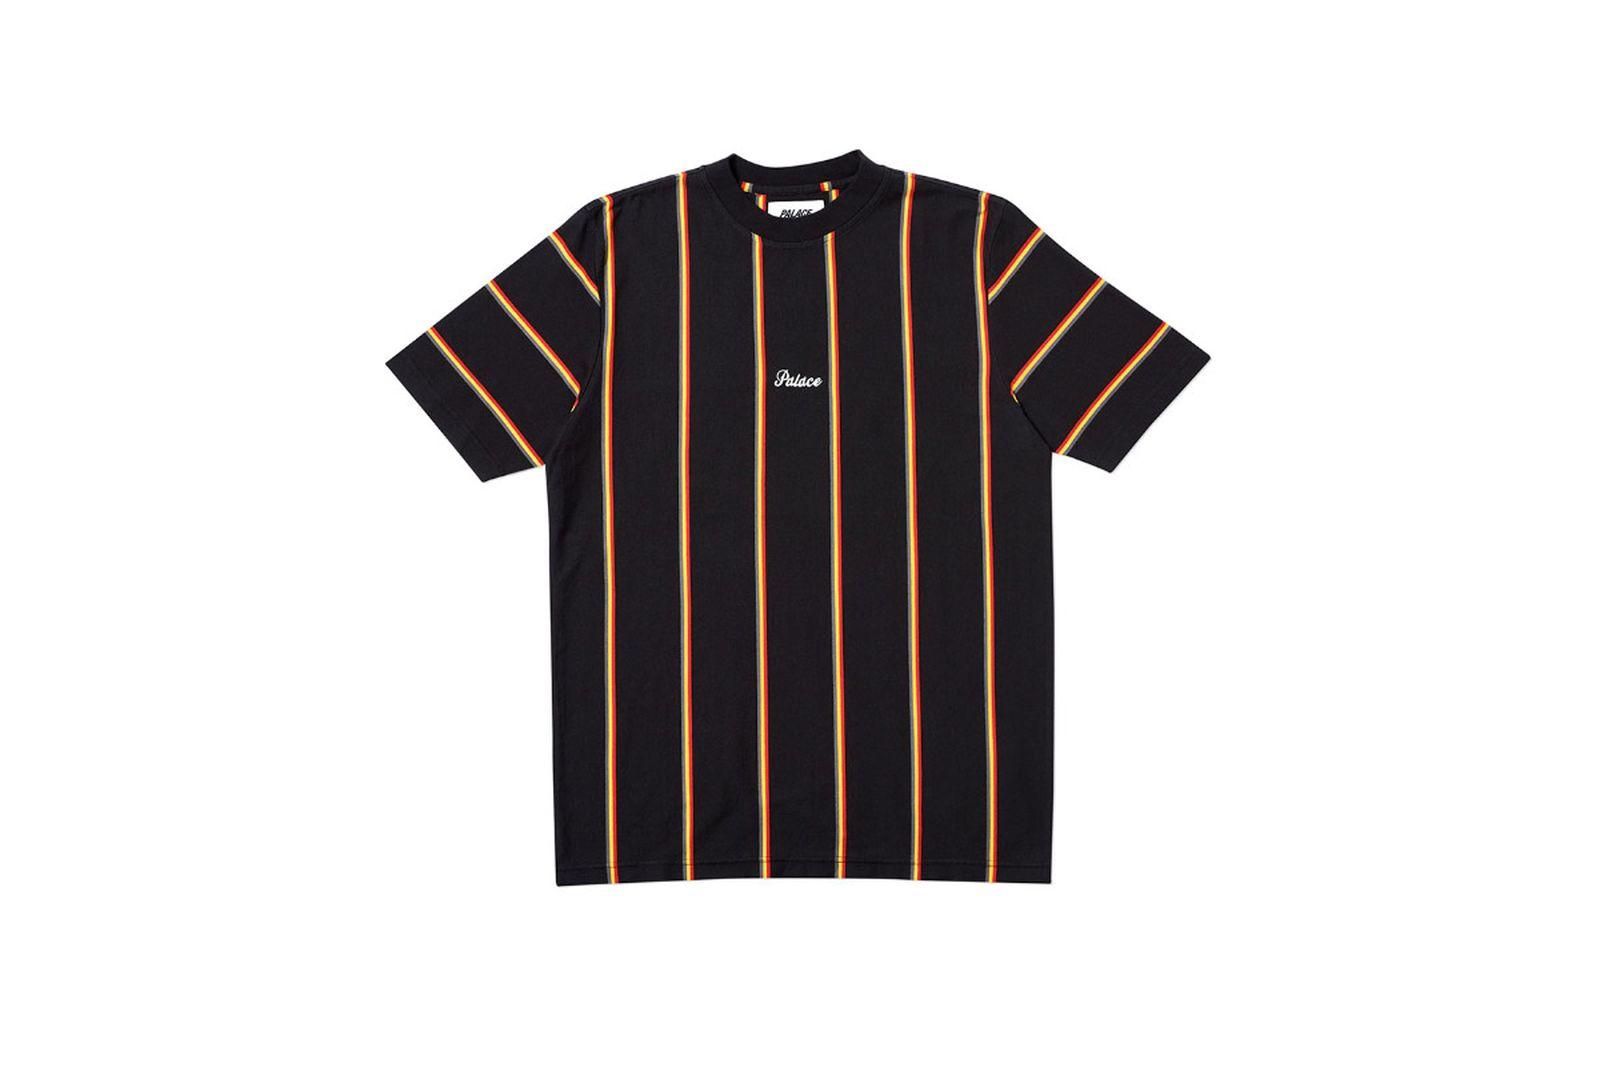 Palace 2019 Autumn T Shirt Vert black front